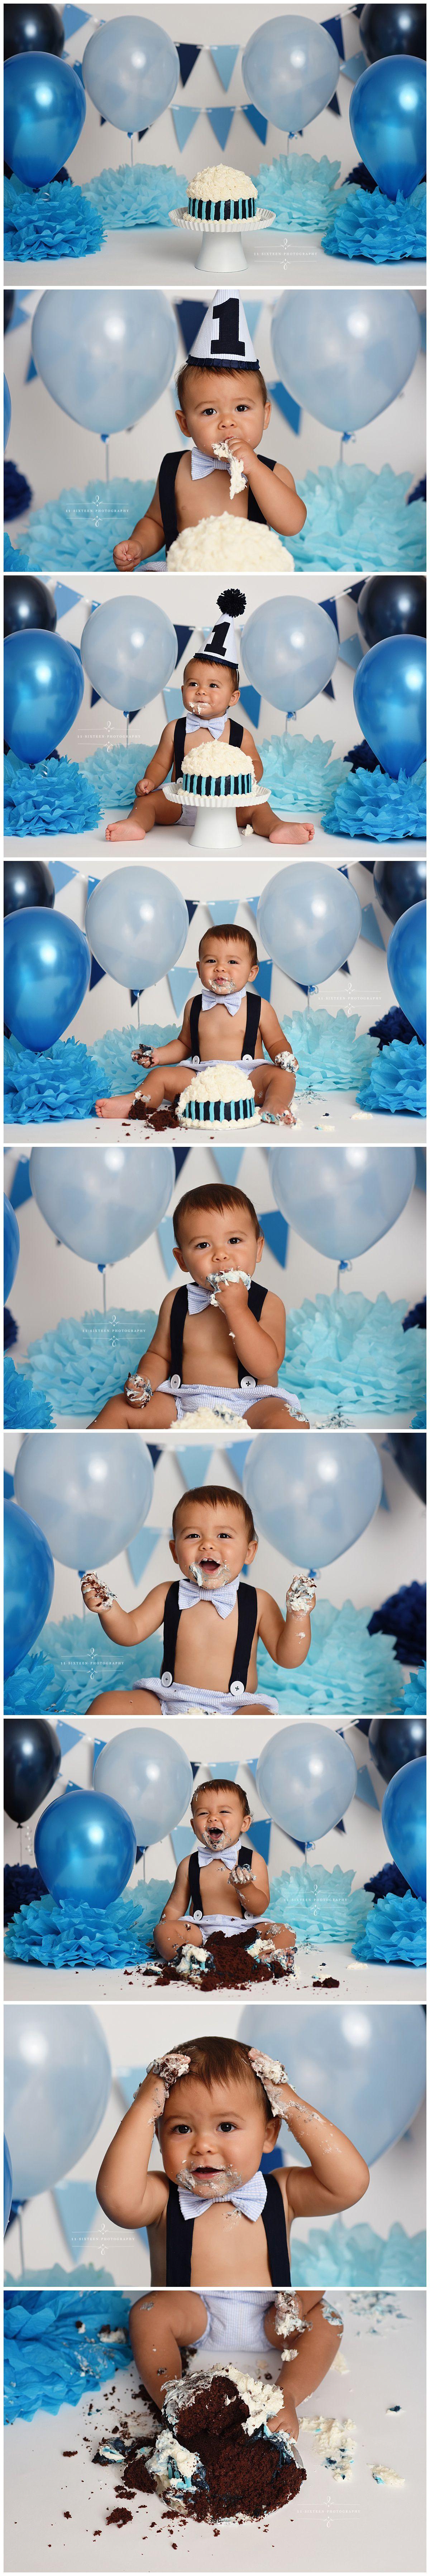 Cake Smash Session Baby Boy First Birthday Hat One Smashing Balloons Banner Inspiration Ideas Setup Blue Navy White